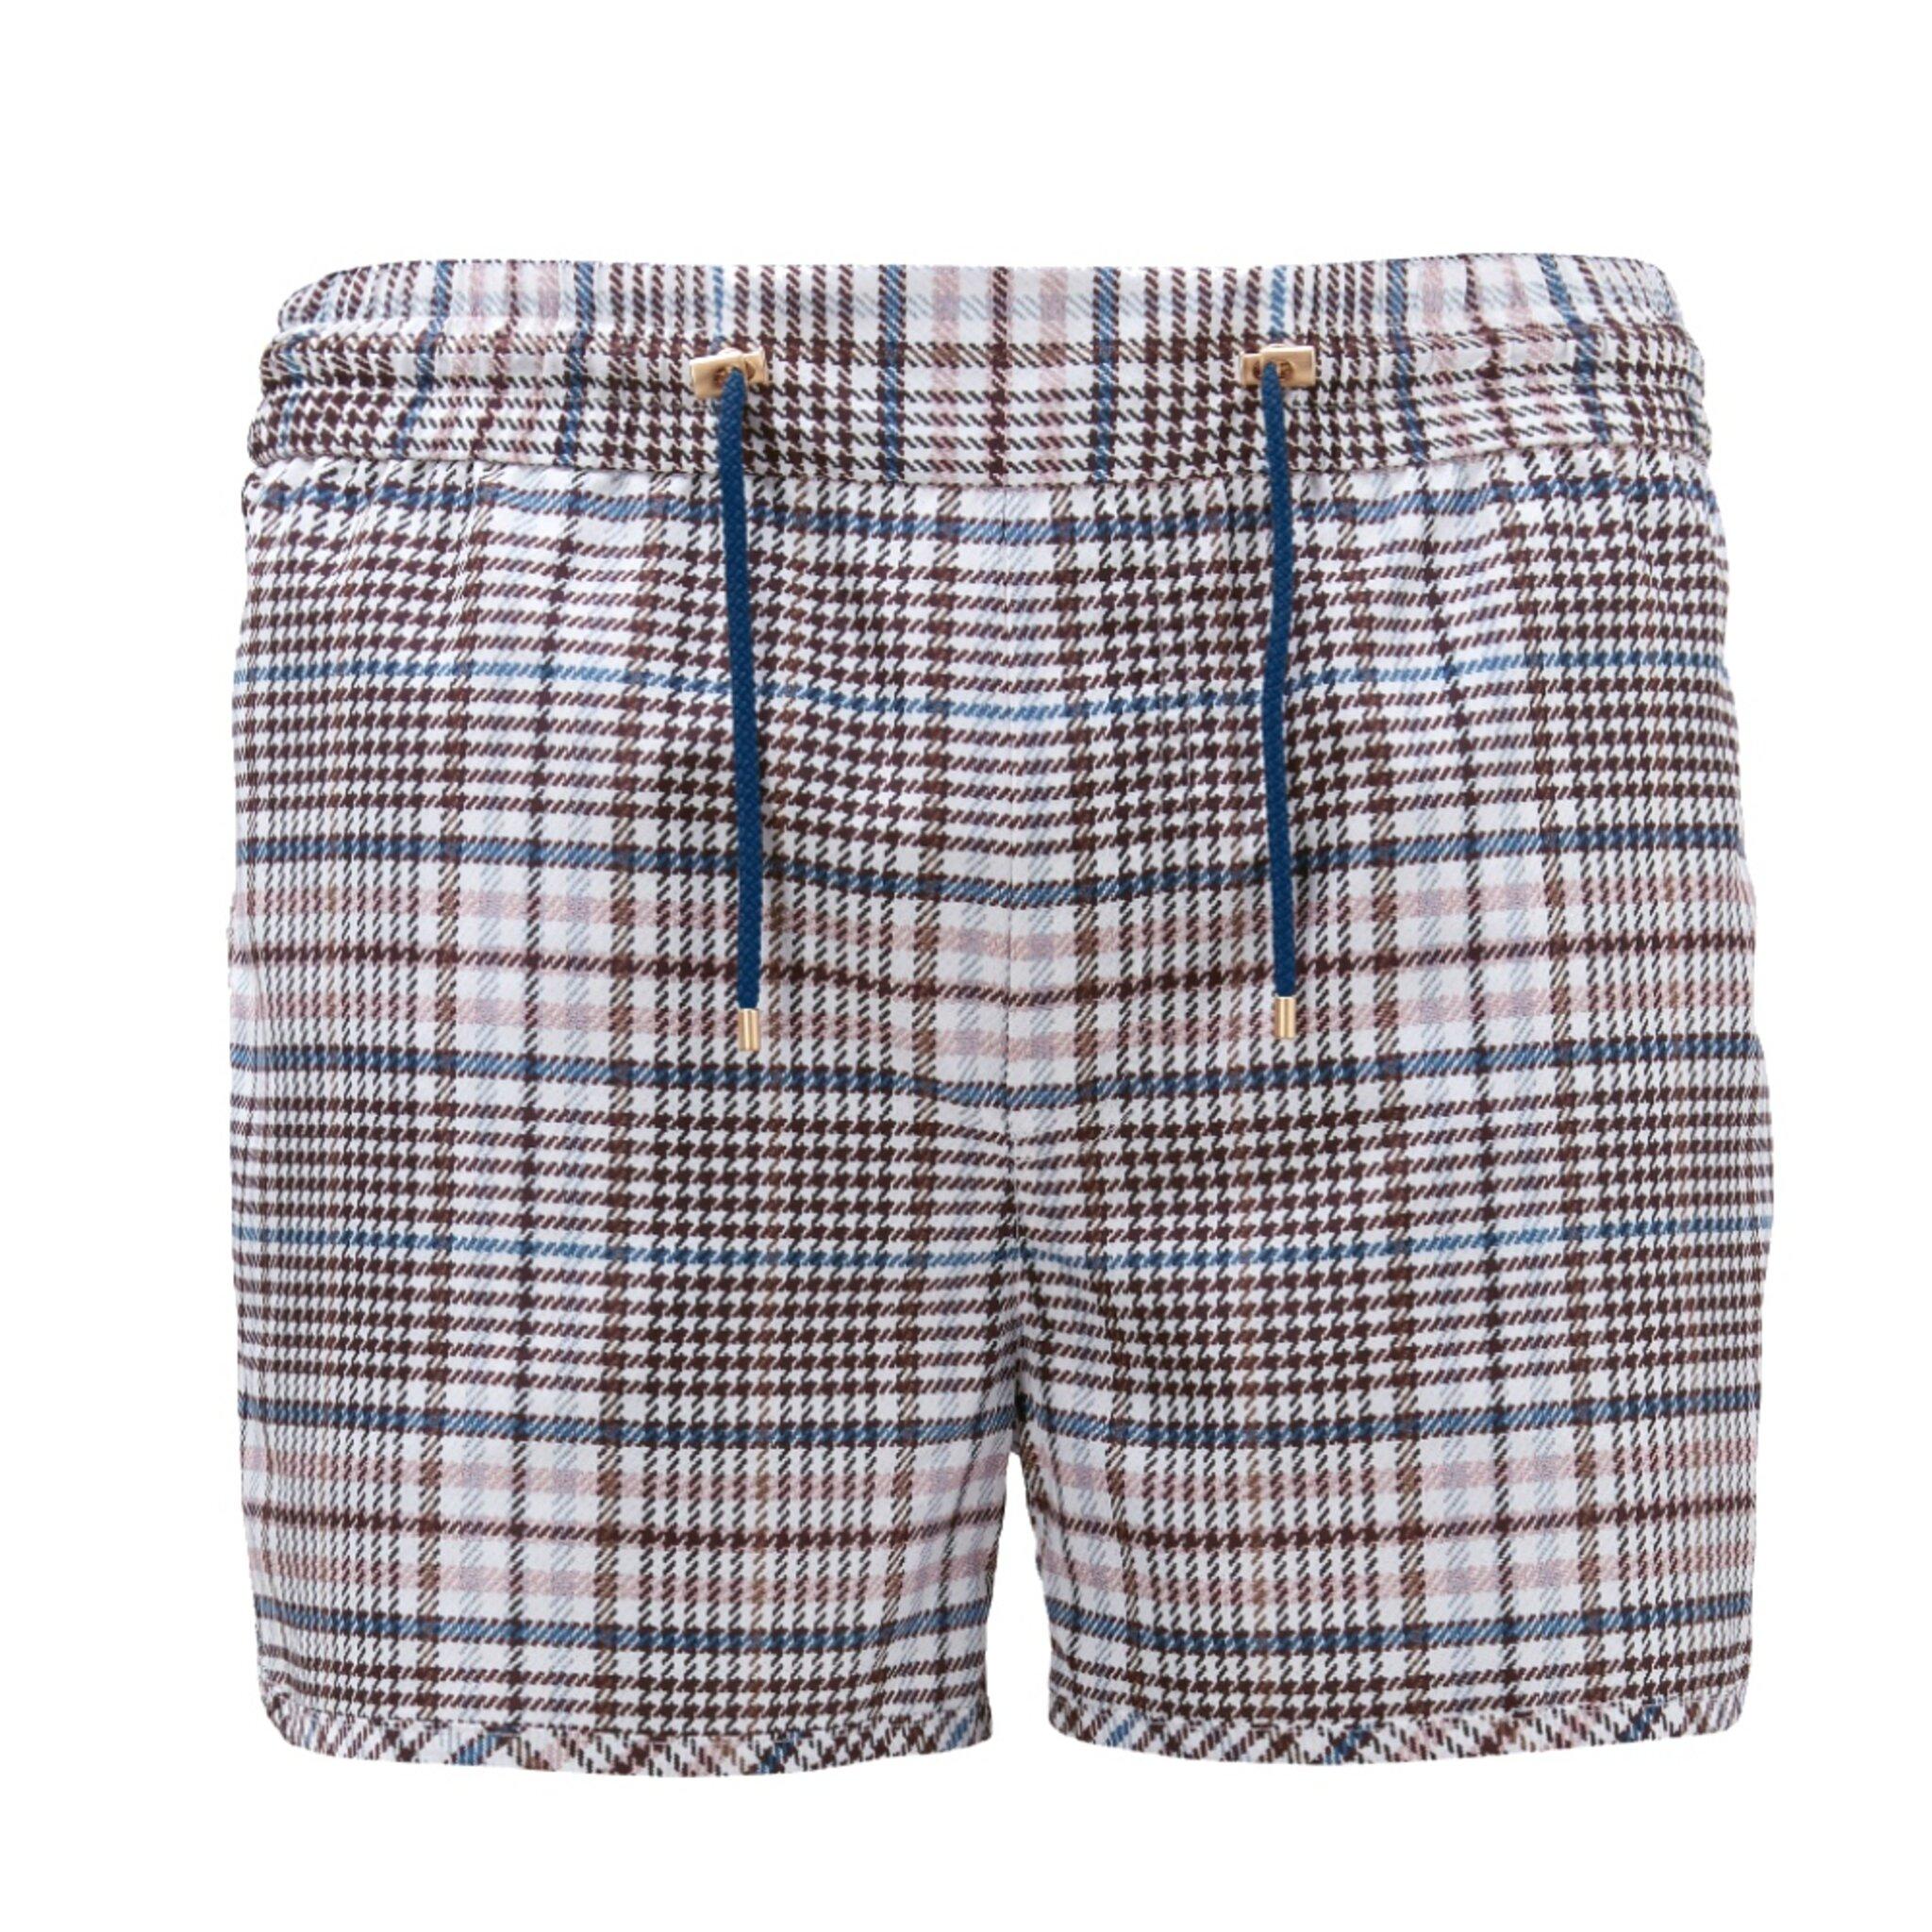 James Nylon Swim Shorts